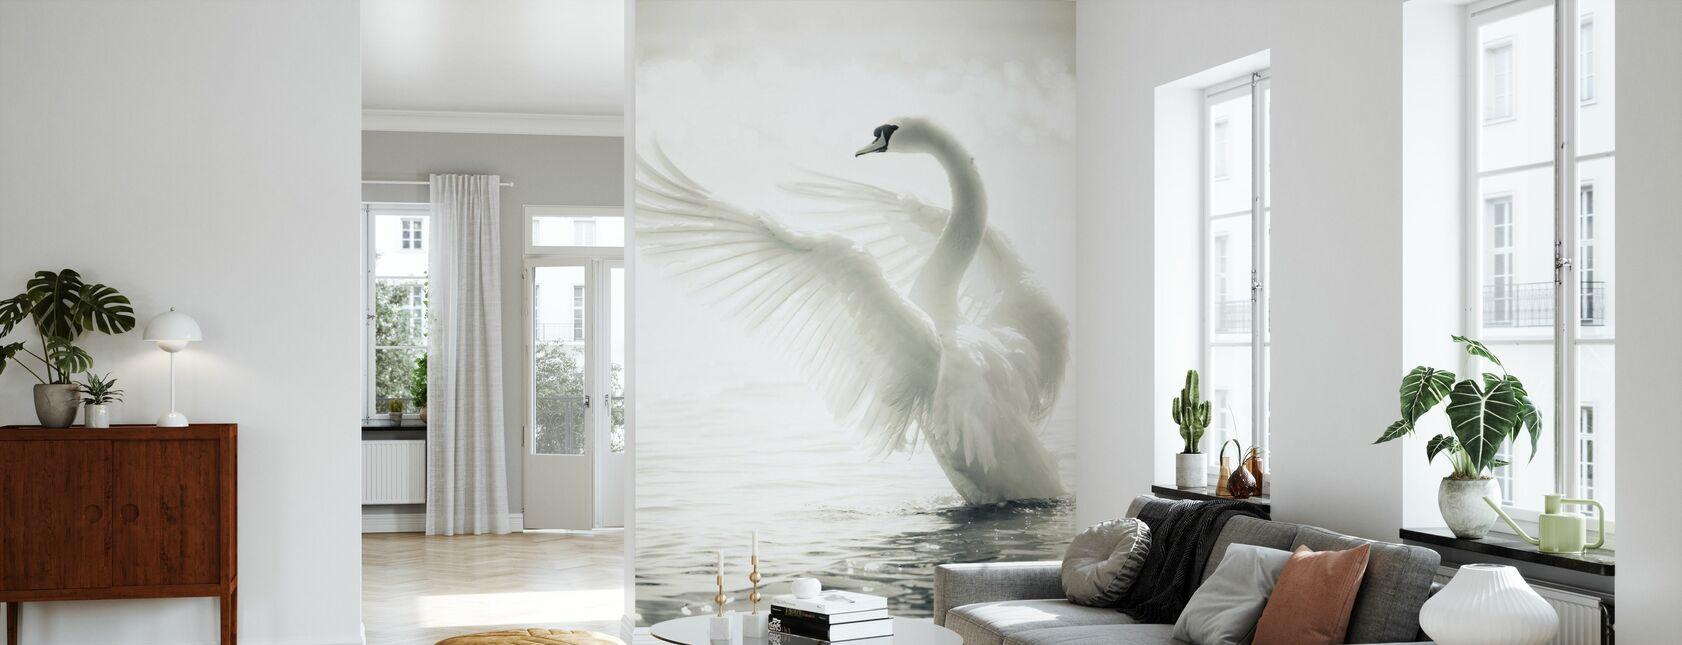 Graceful Swan - Wallpaper - Living Room